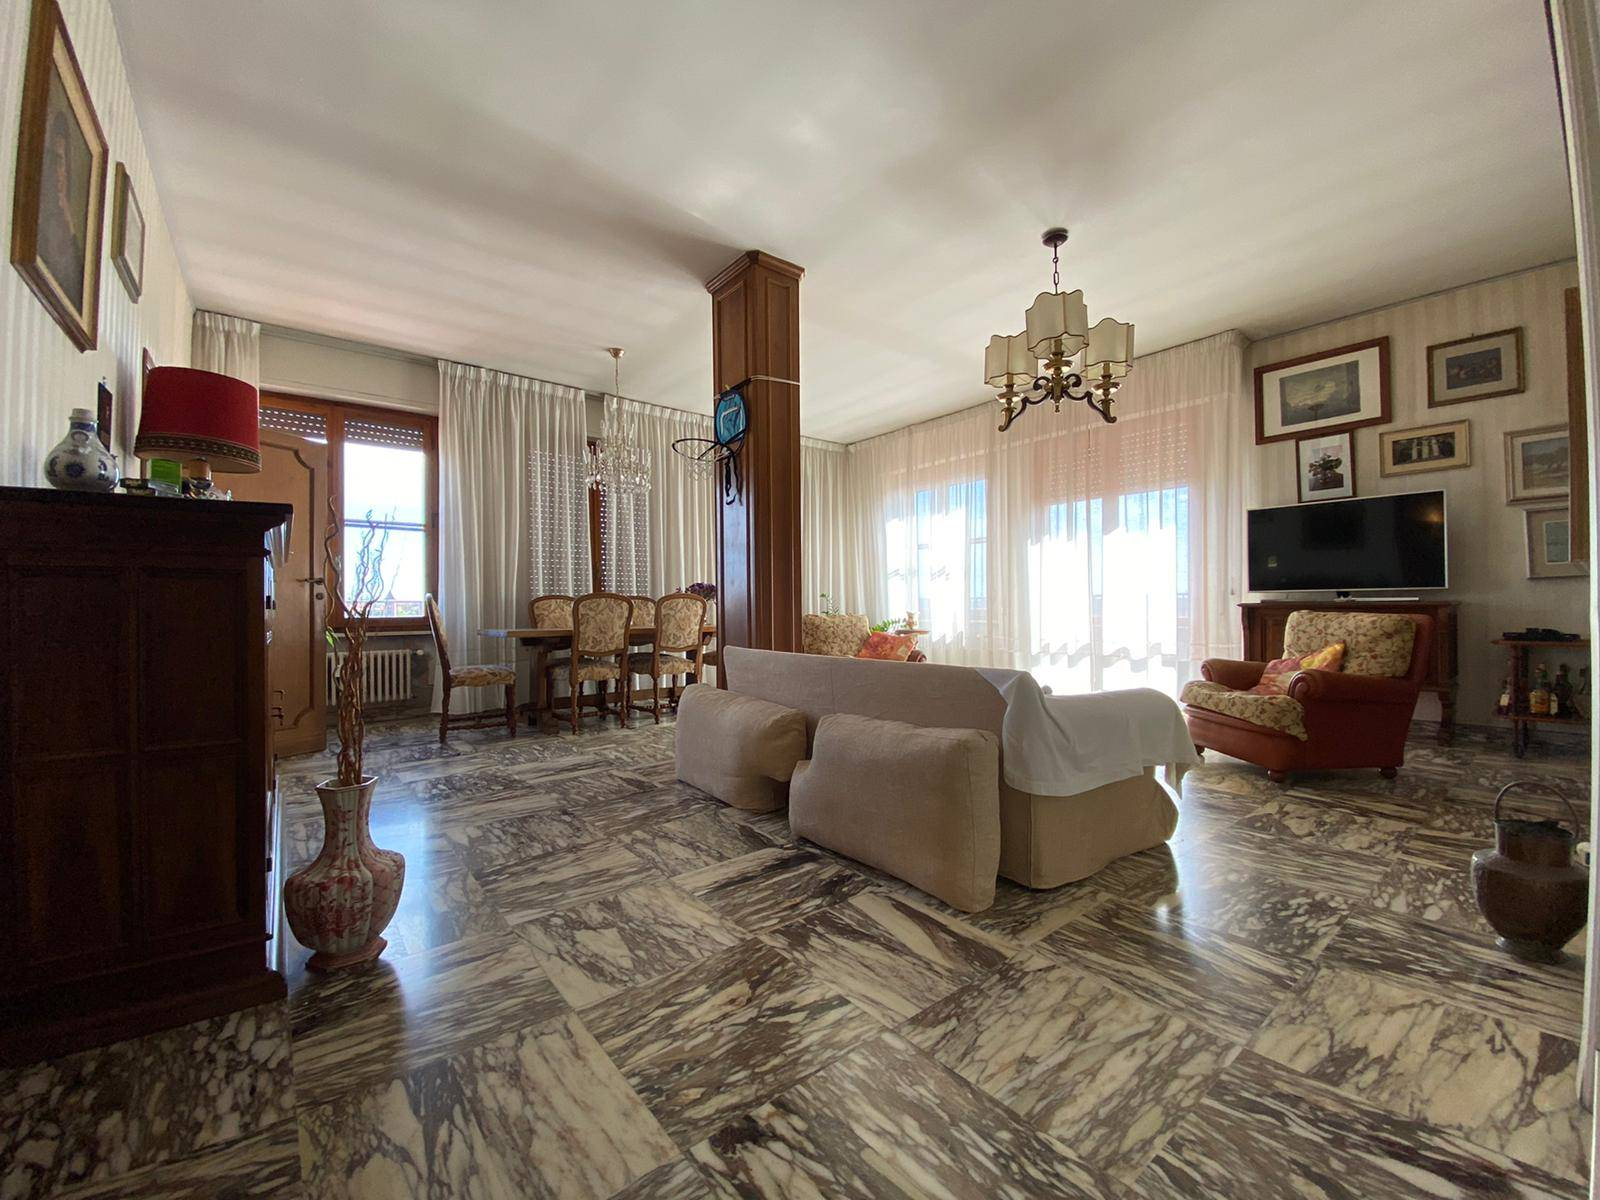 Attico / Mansarda in vendita a Pisa, 6 locali, zona a a Lucca, Trattative riservate | PortaleAgenzieImmobiliari.it